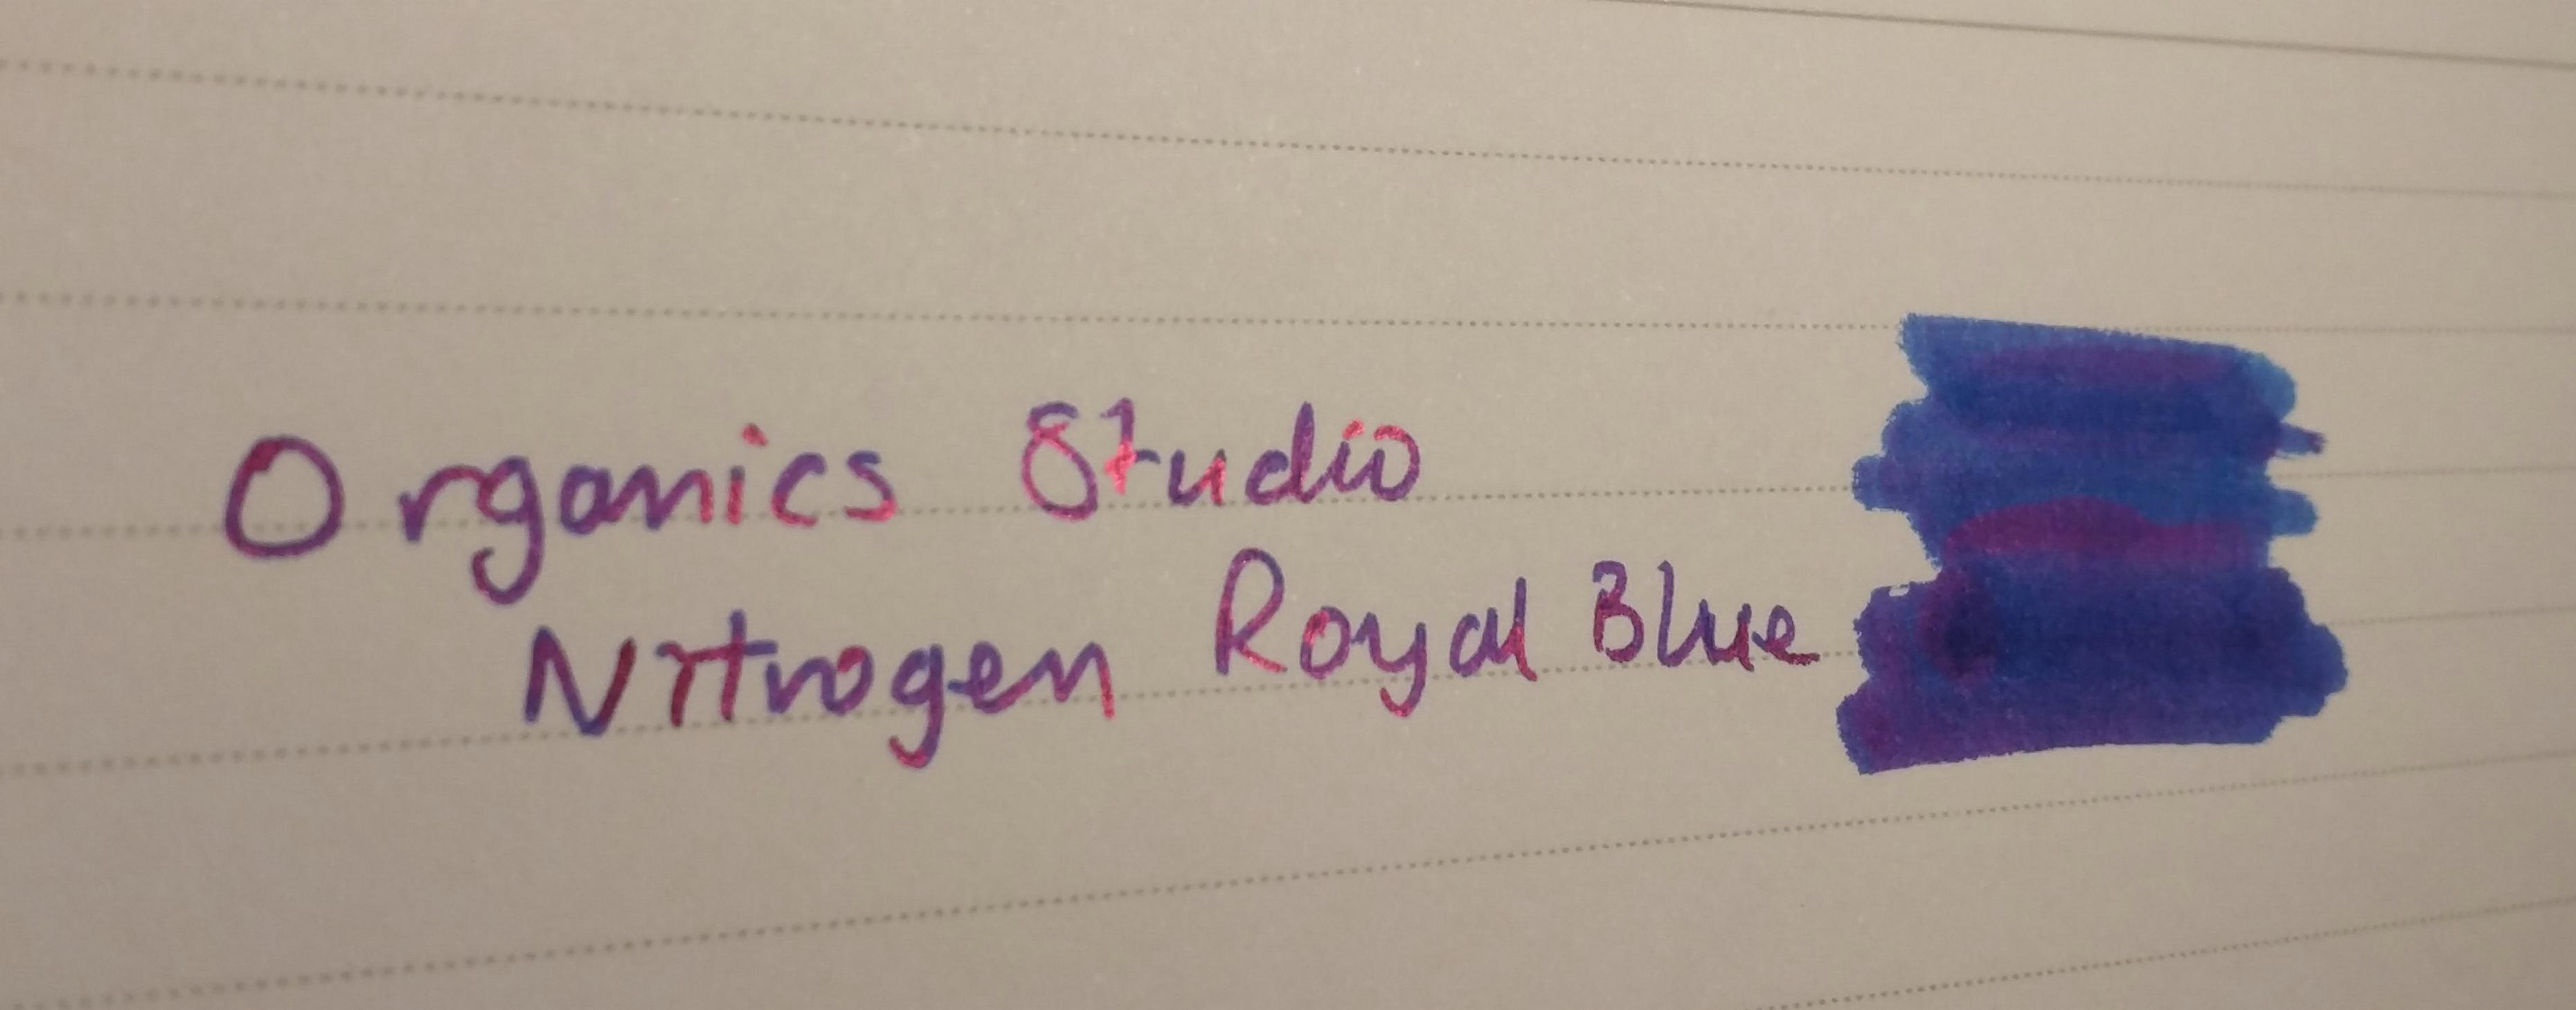 Nitrogen Royal Blue sheen